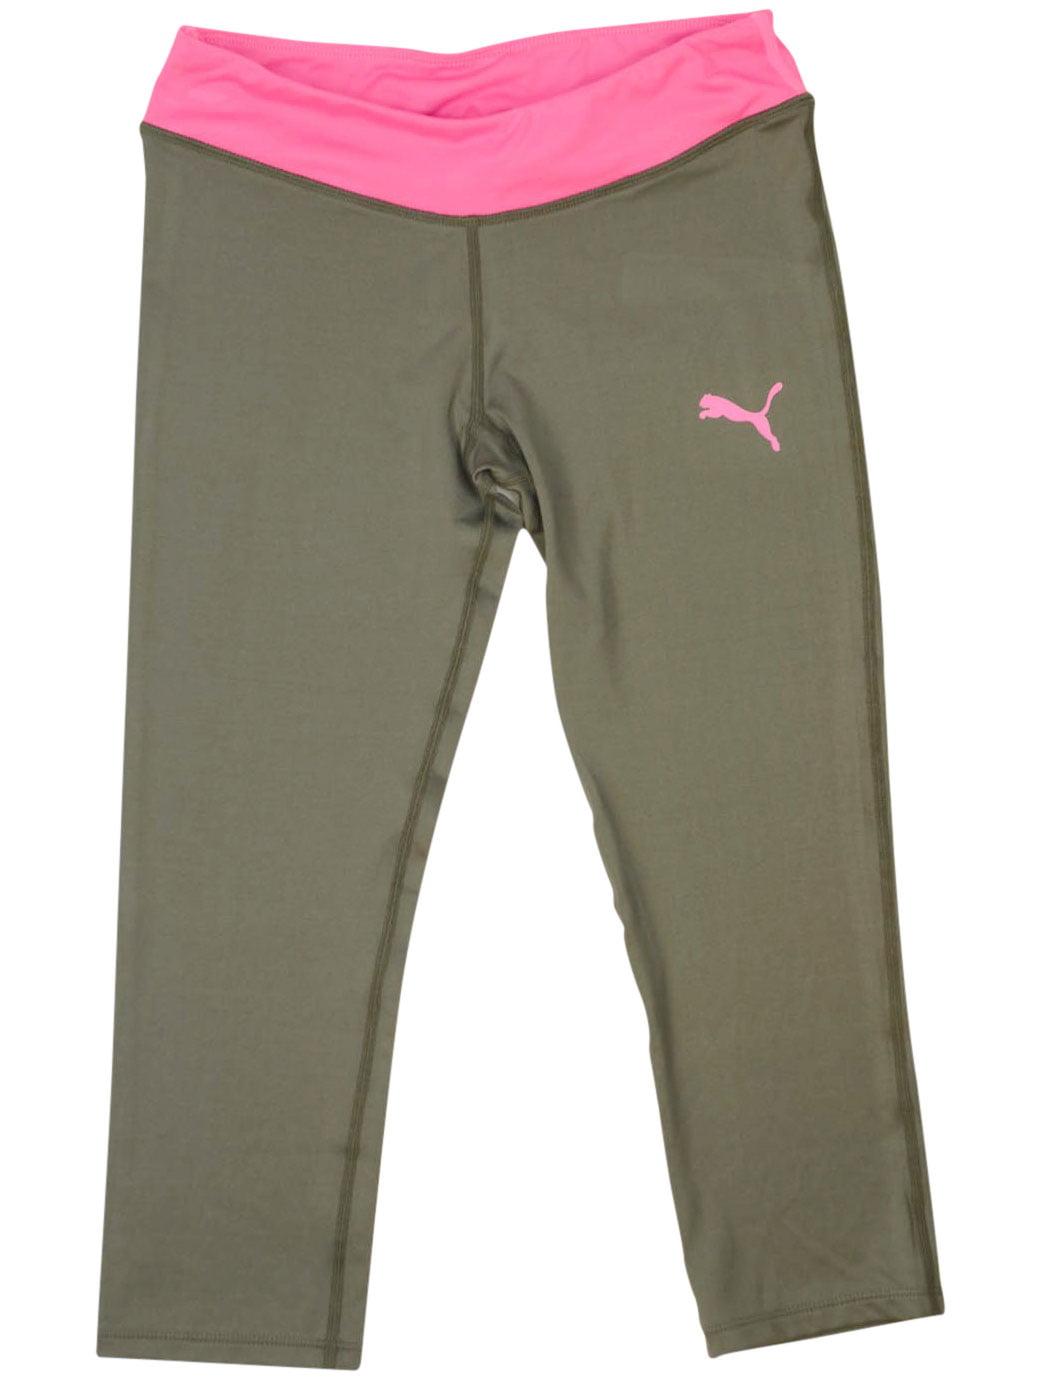 PUMA Big Girls Capri Leggings Activewear Workout Gym Crop Pants Black Yoga Pants  Active Clothing